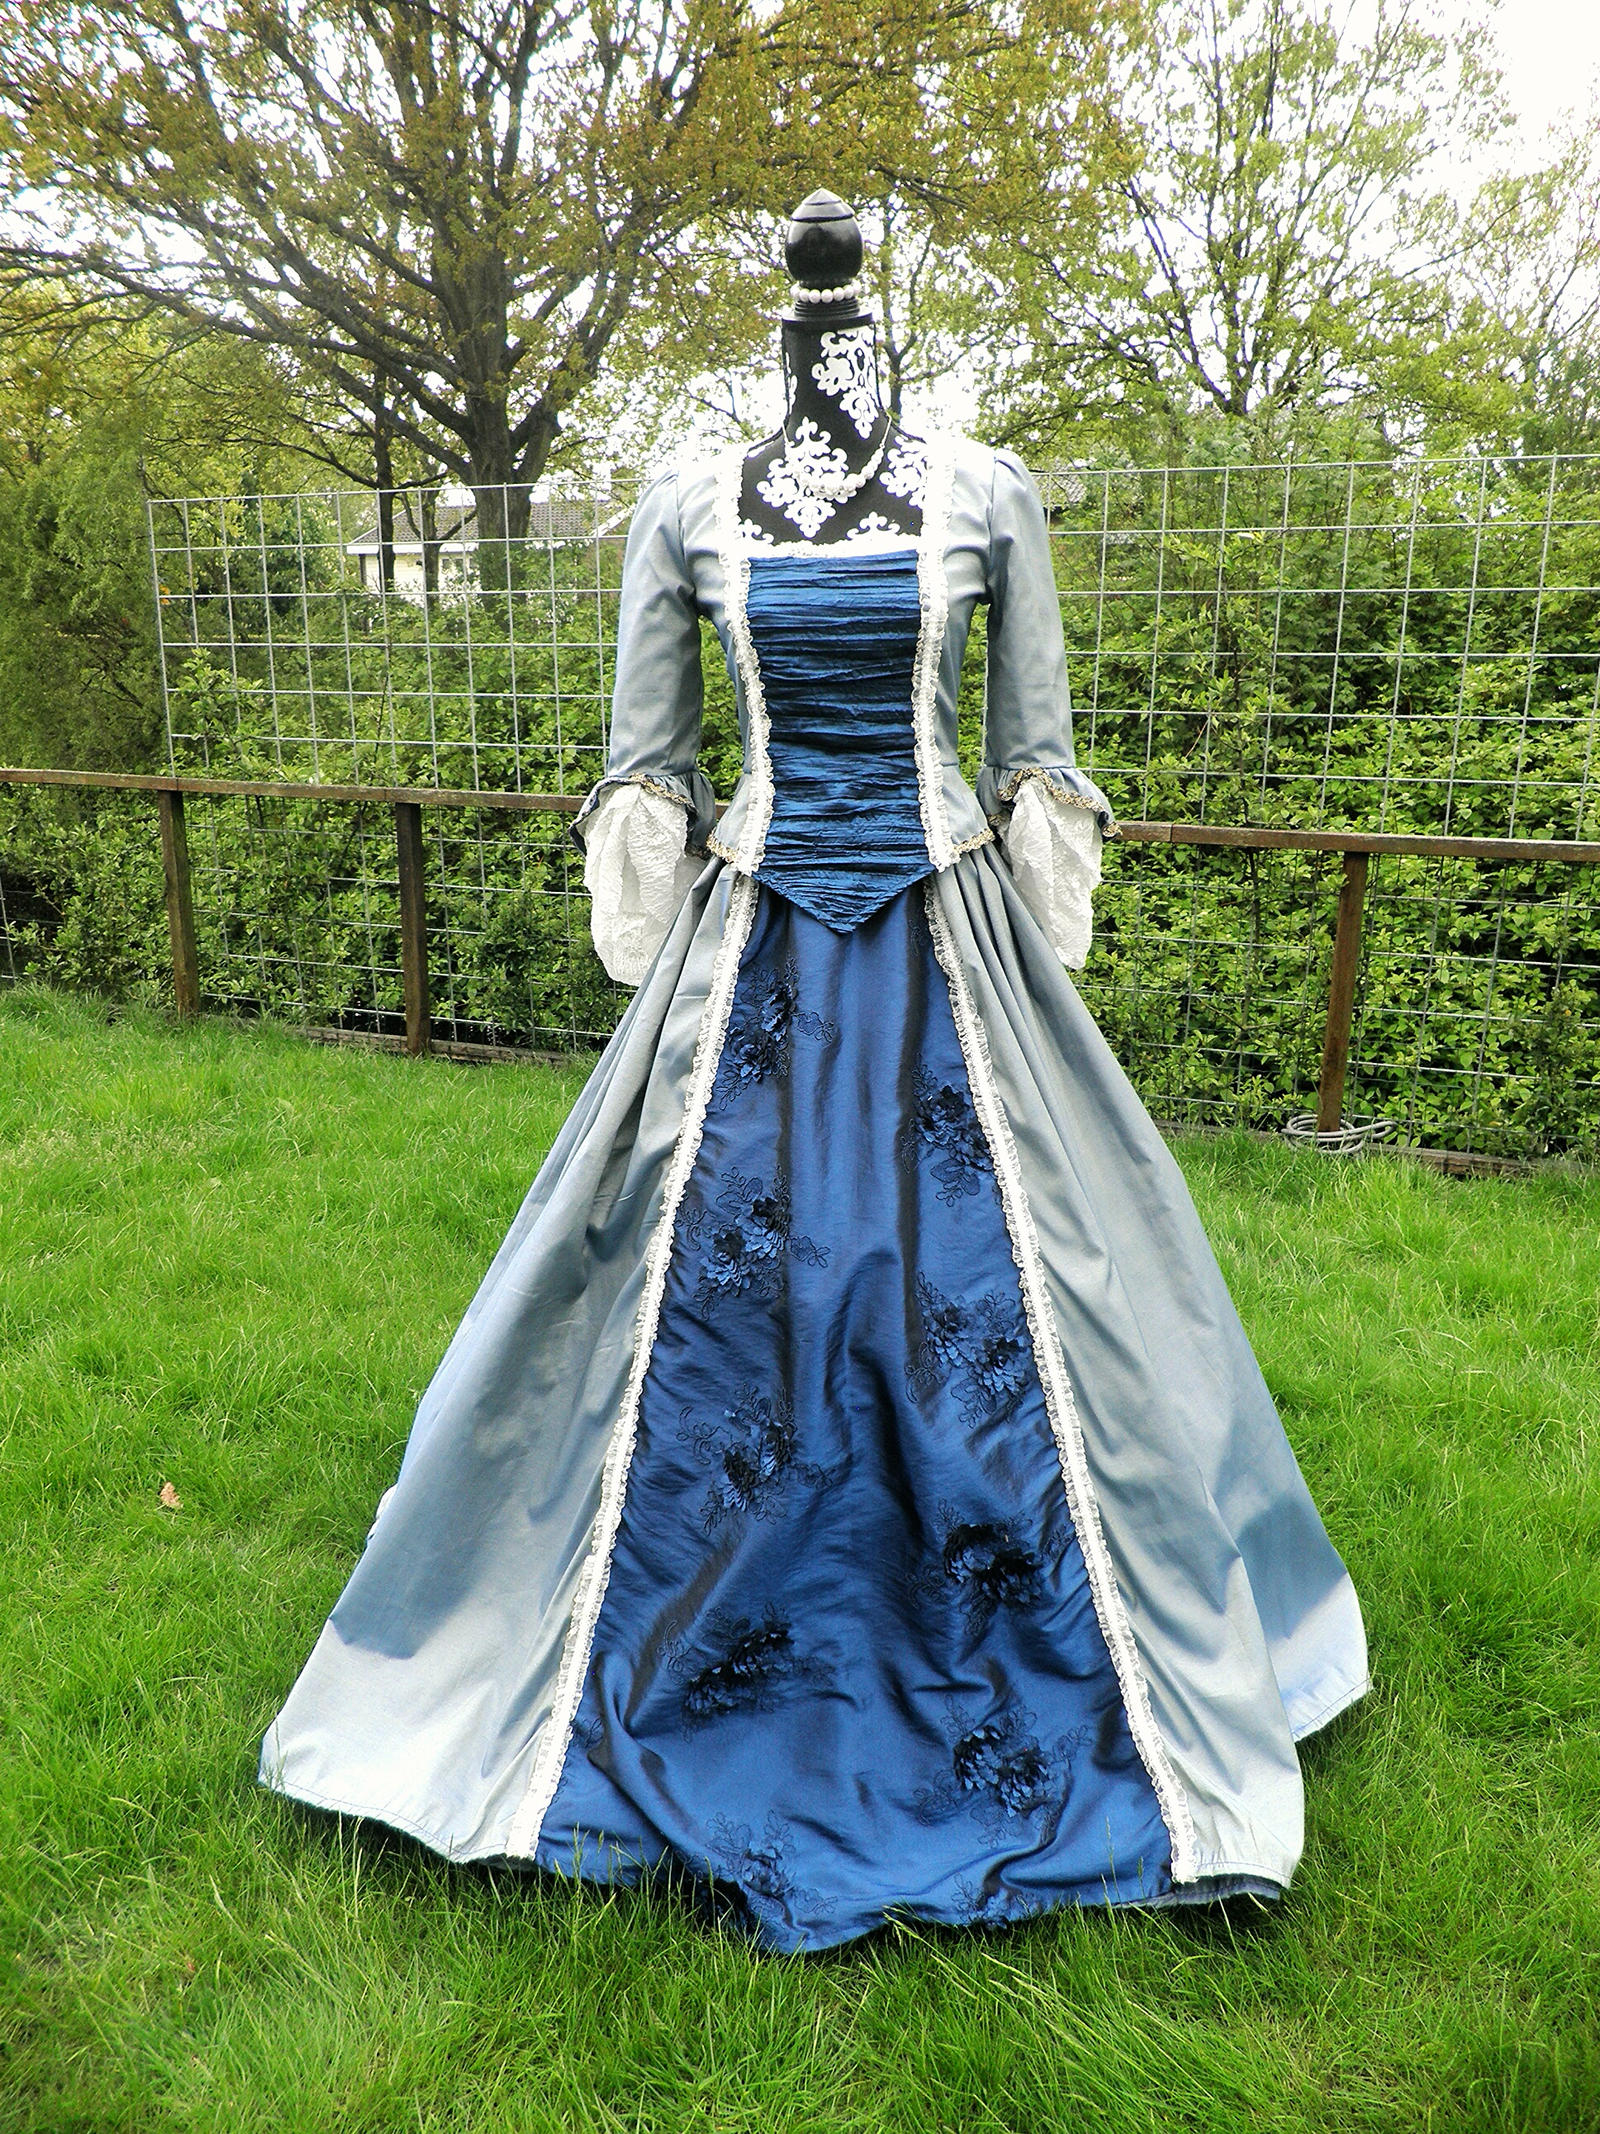 Buy 18 century dress pictures